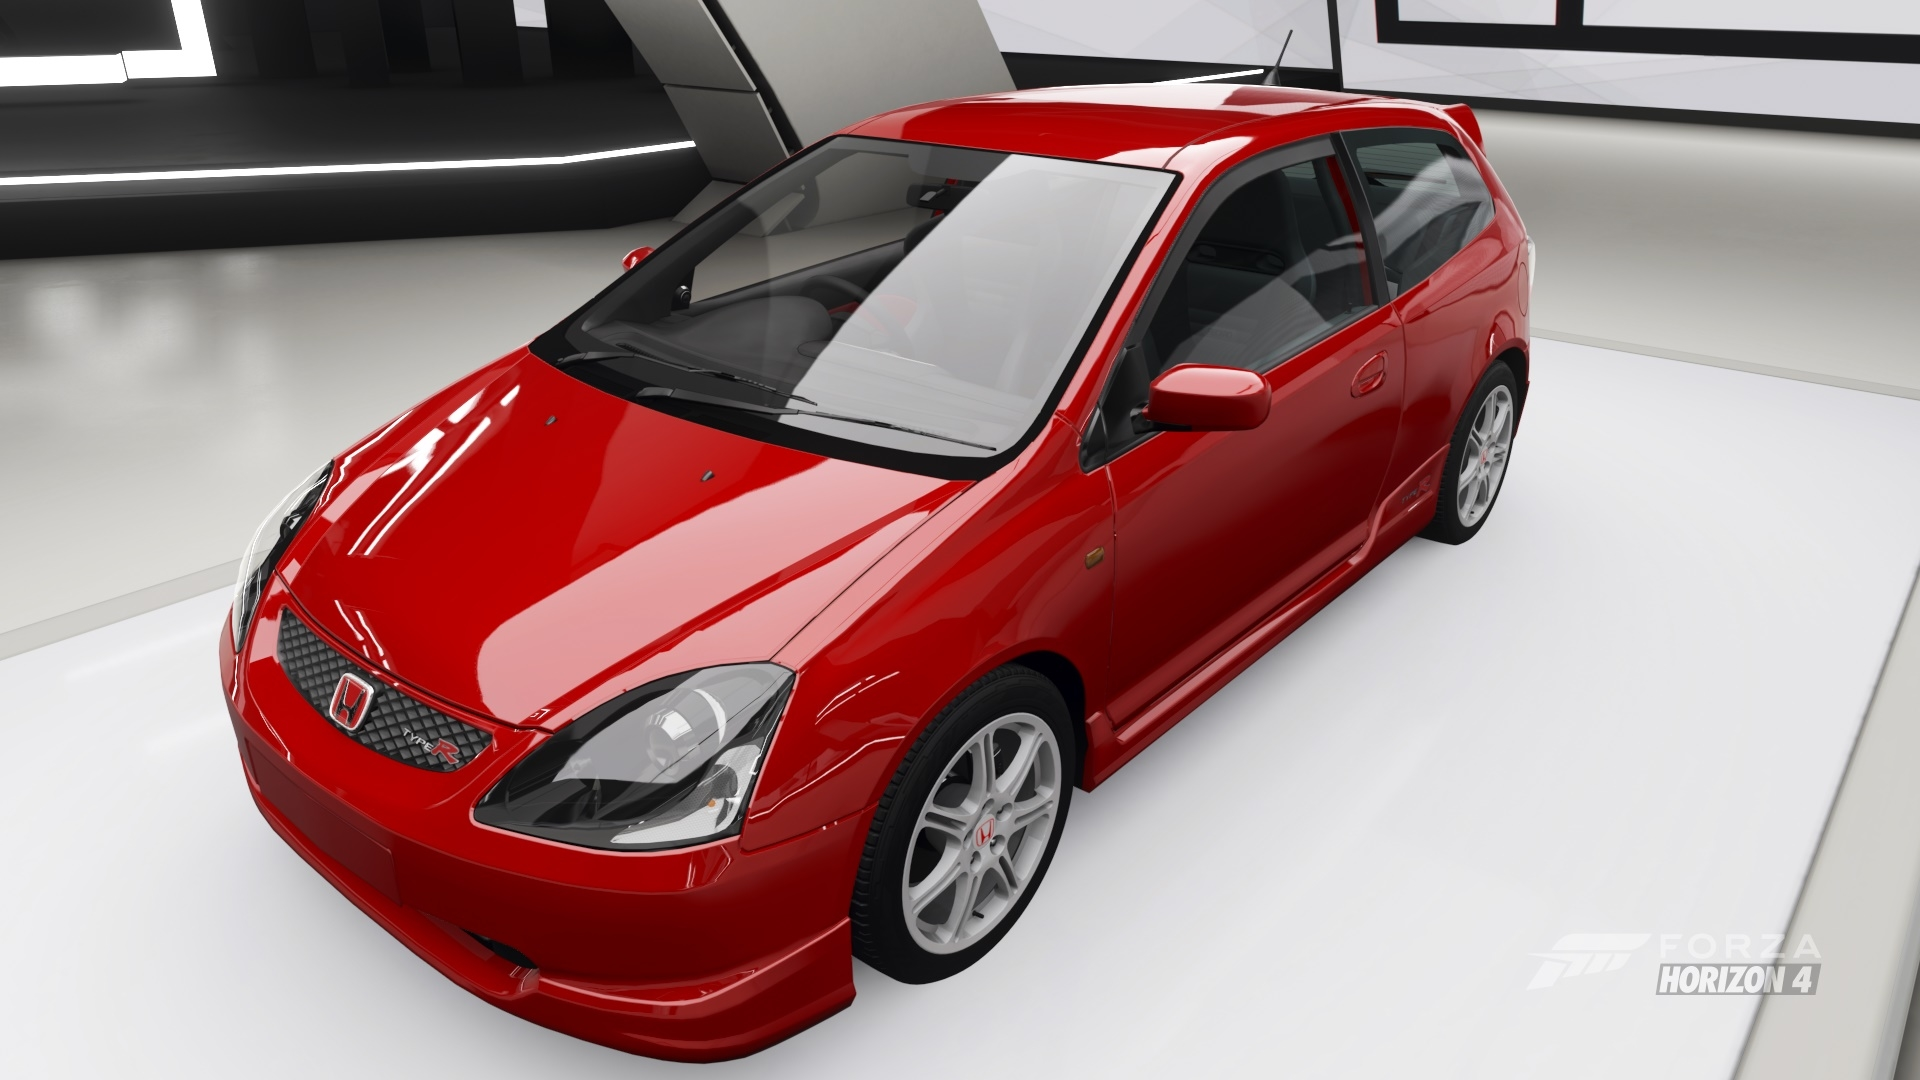 Honda Civic 2004 Honda Civic Si Ep3 Specs